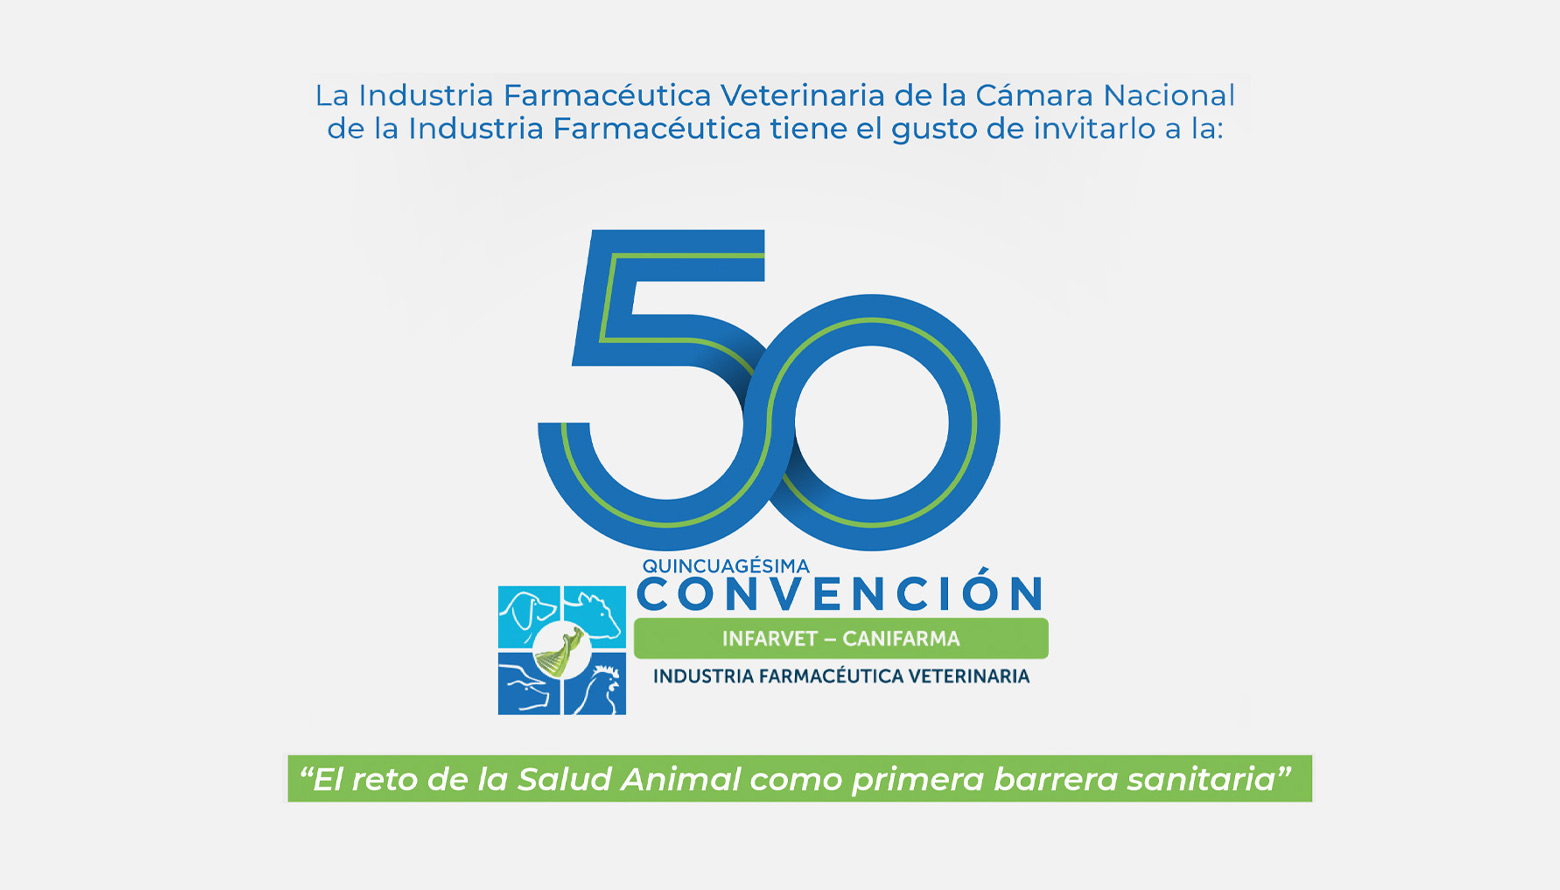 Quincuagésima Convención INFARVET- CANIFARMA: